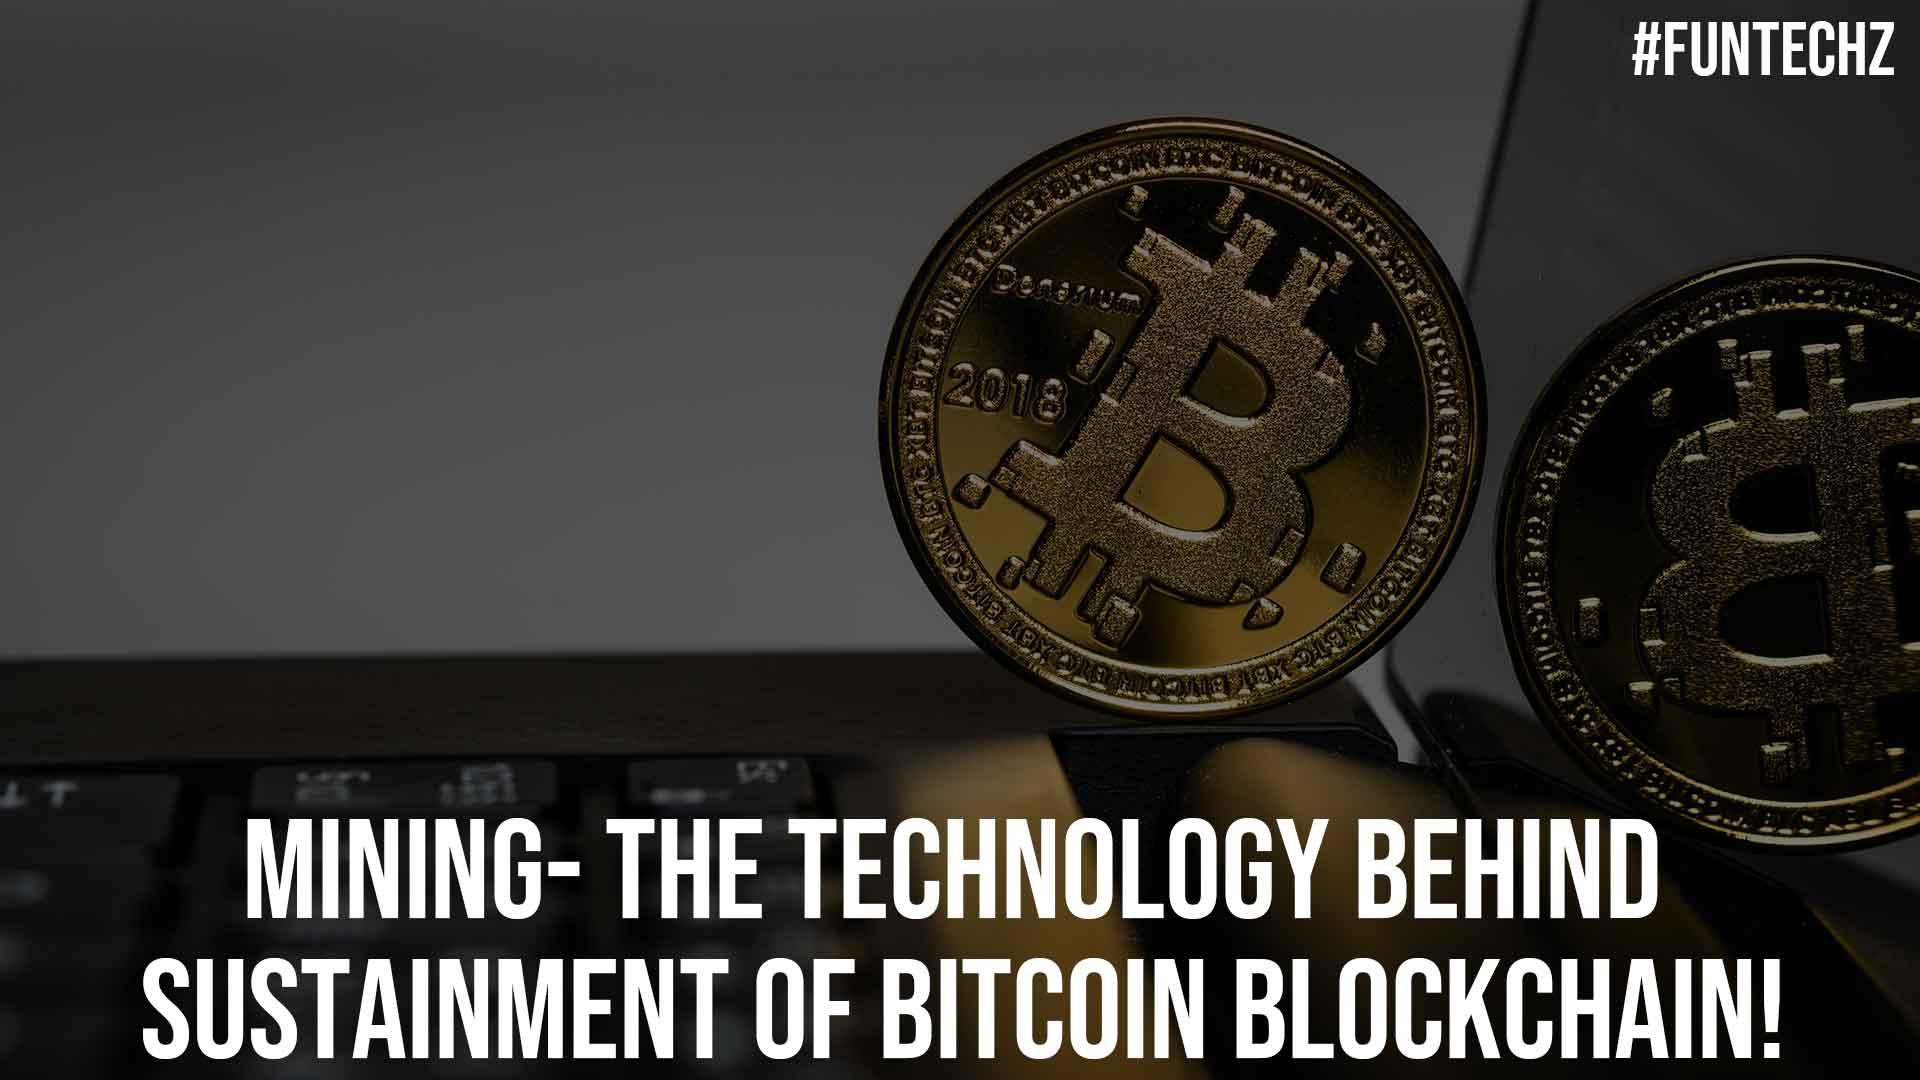 Mining The Technology behind Sustainment of Bitcoin Blockchain